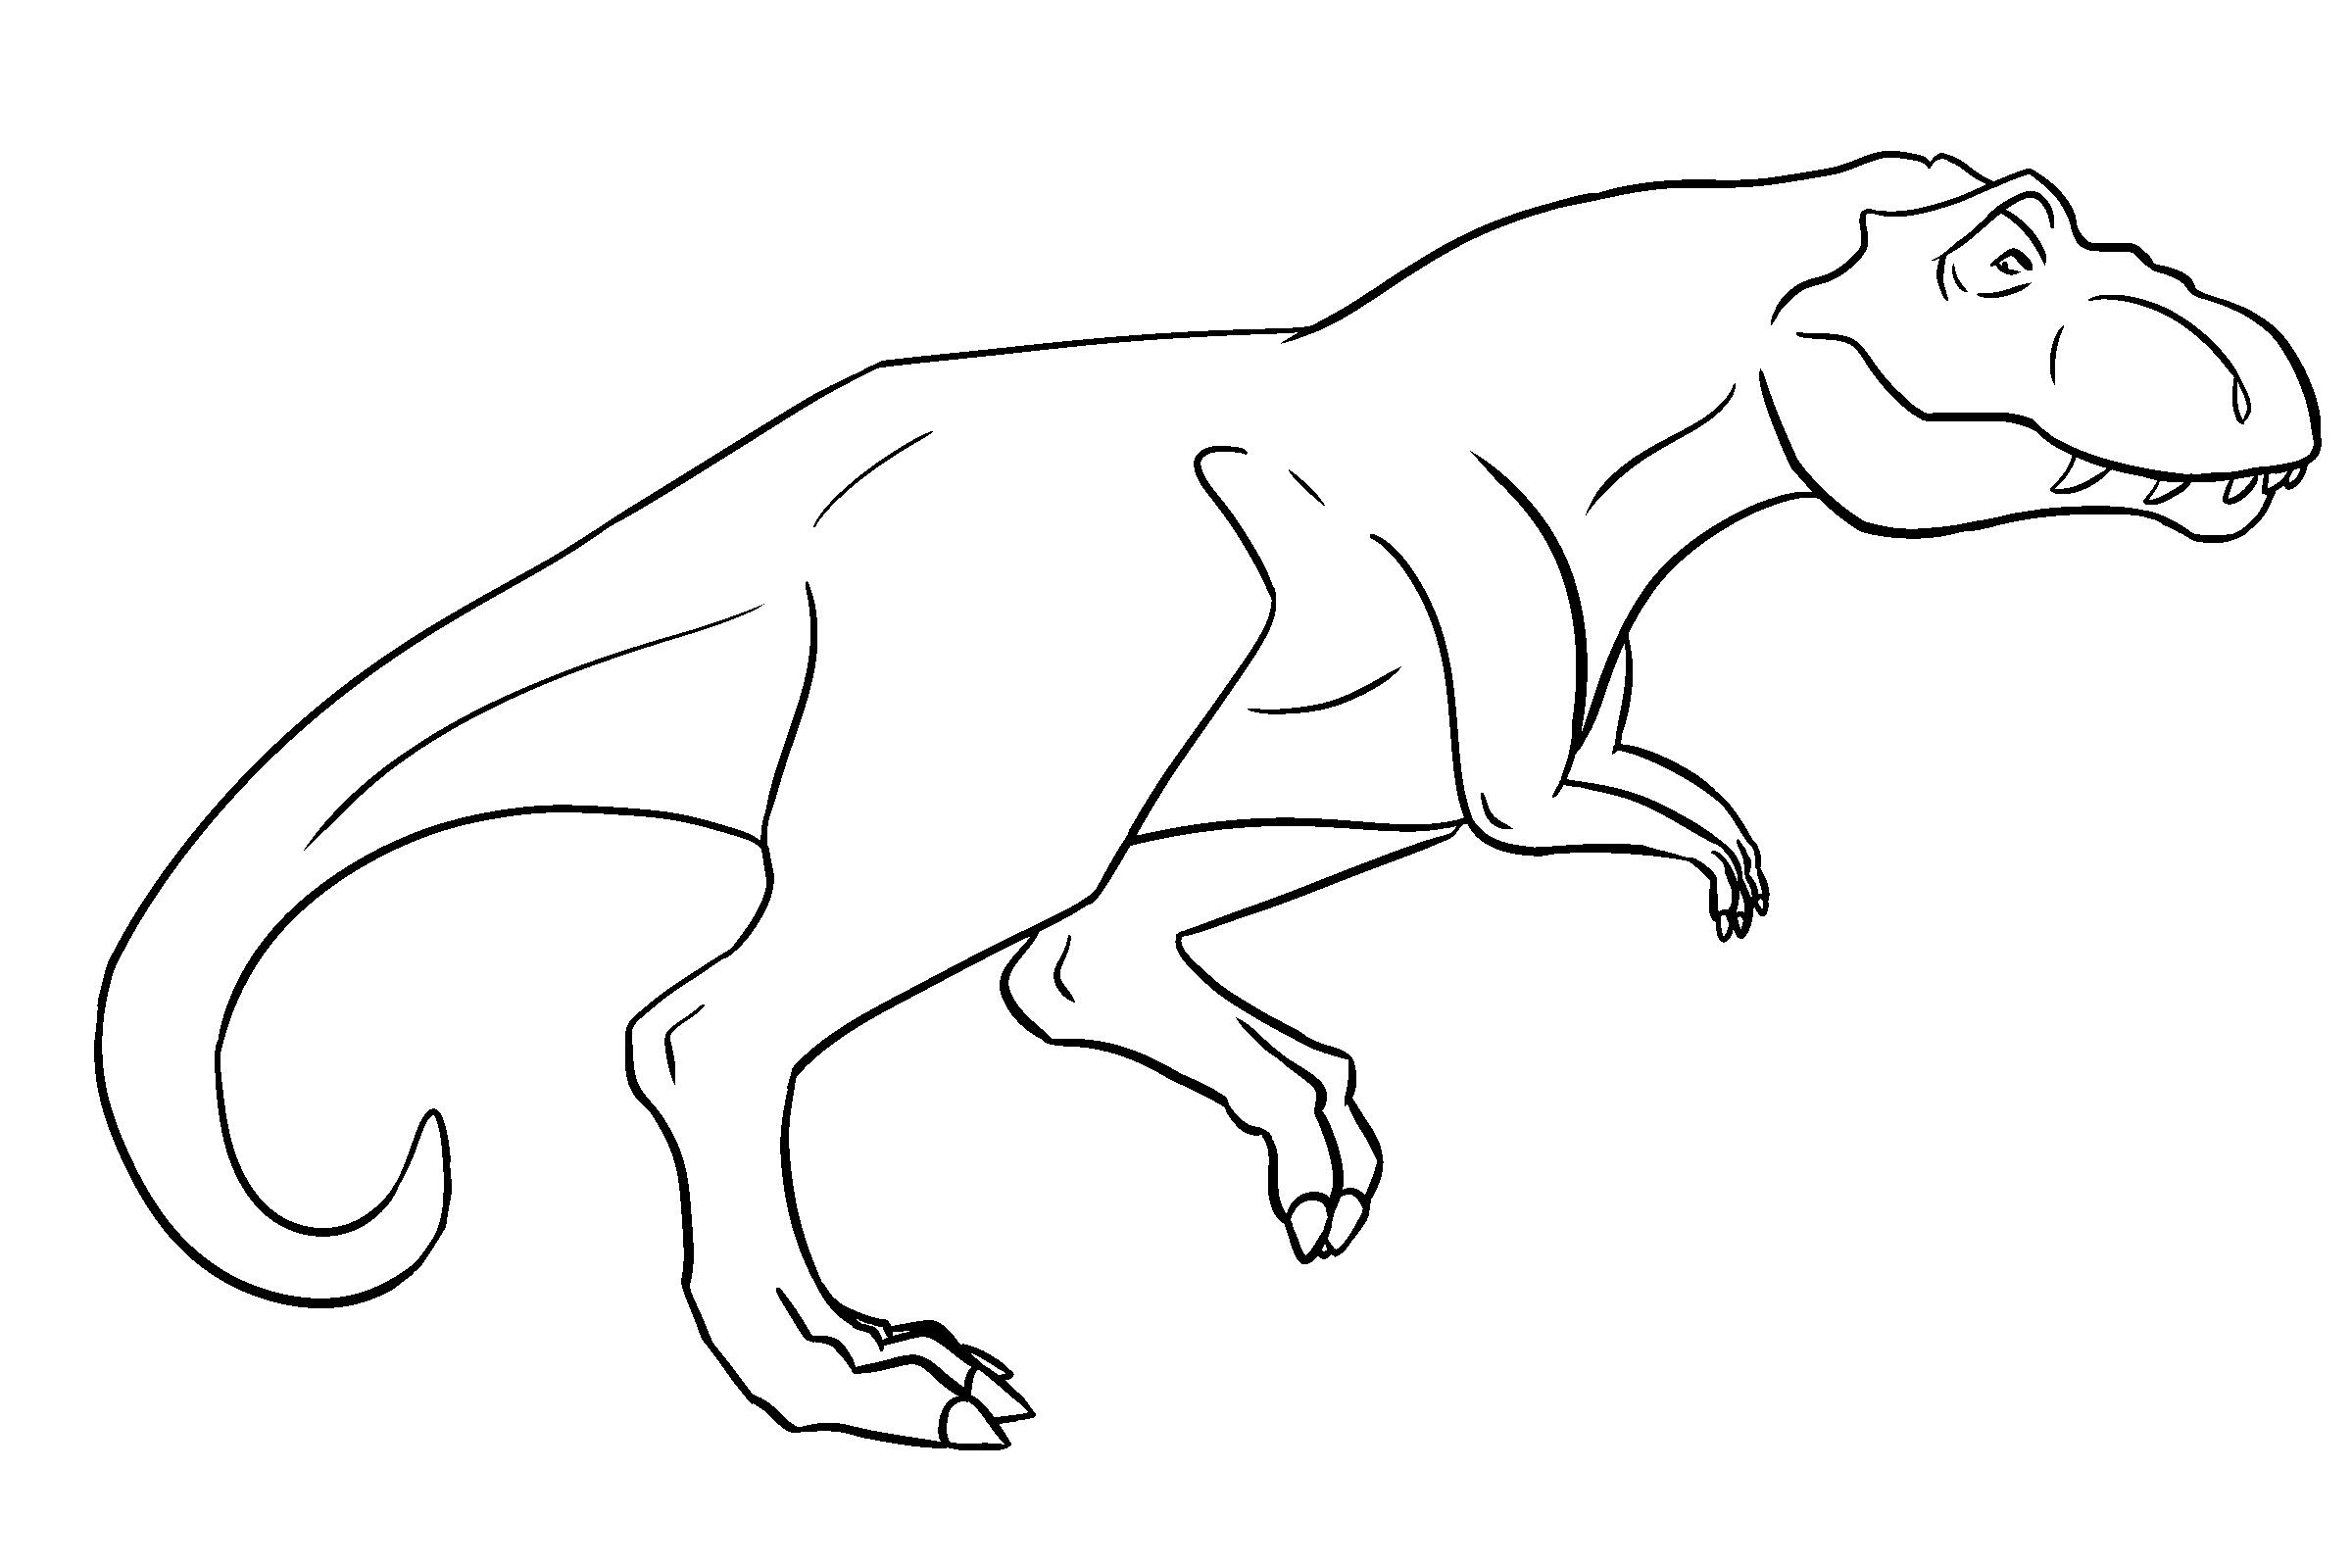 Line Art Dinosaur : Ms paint friendly t rex lineart by bananaflavoredshroom on